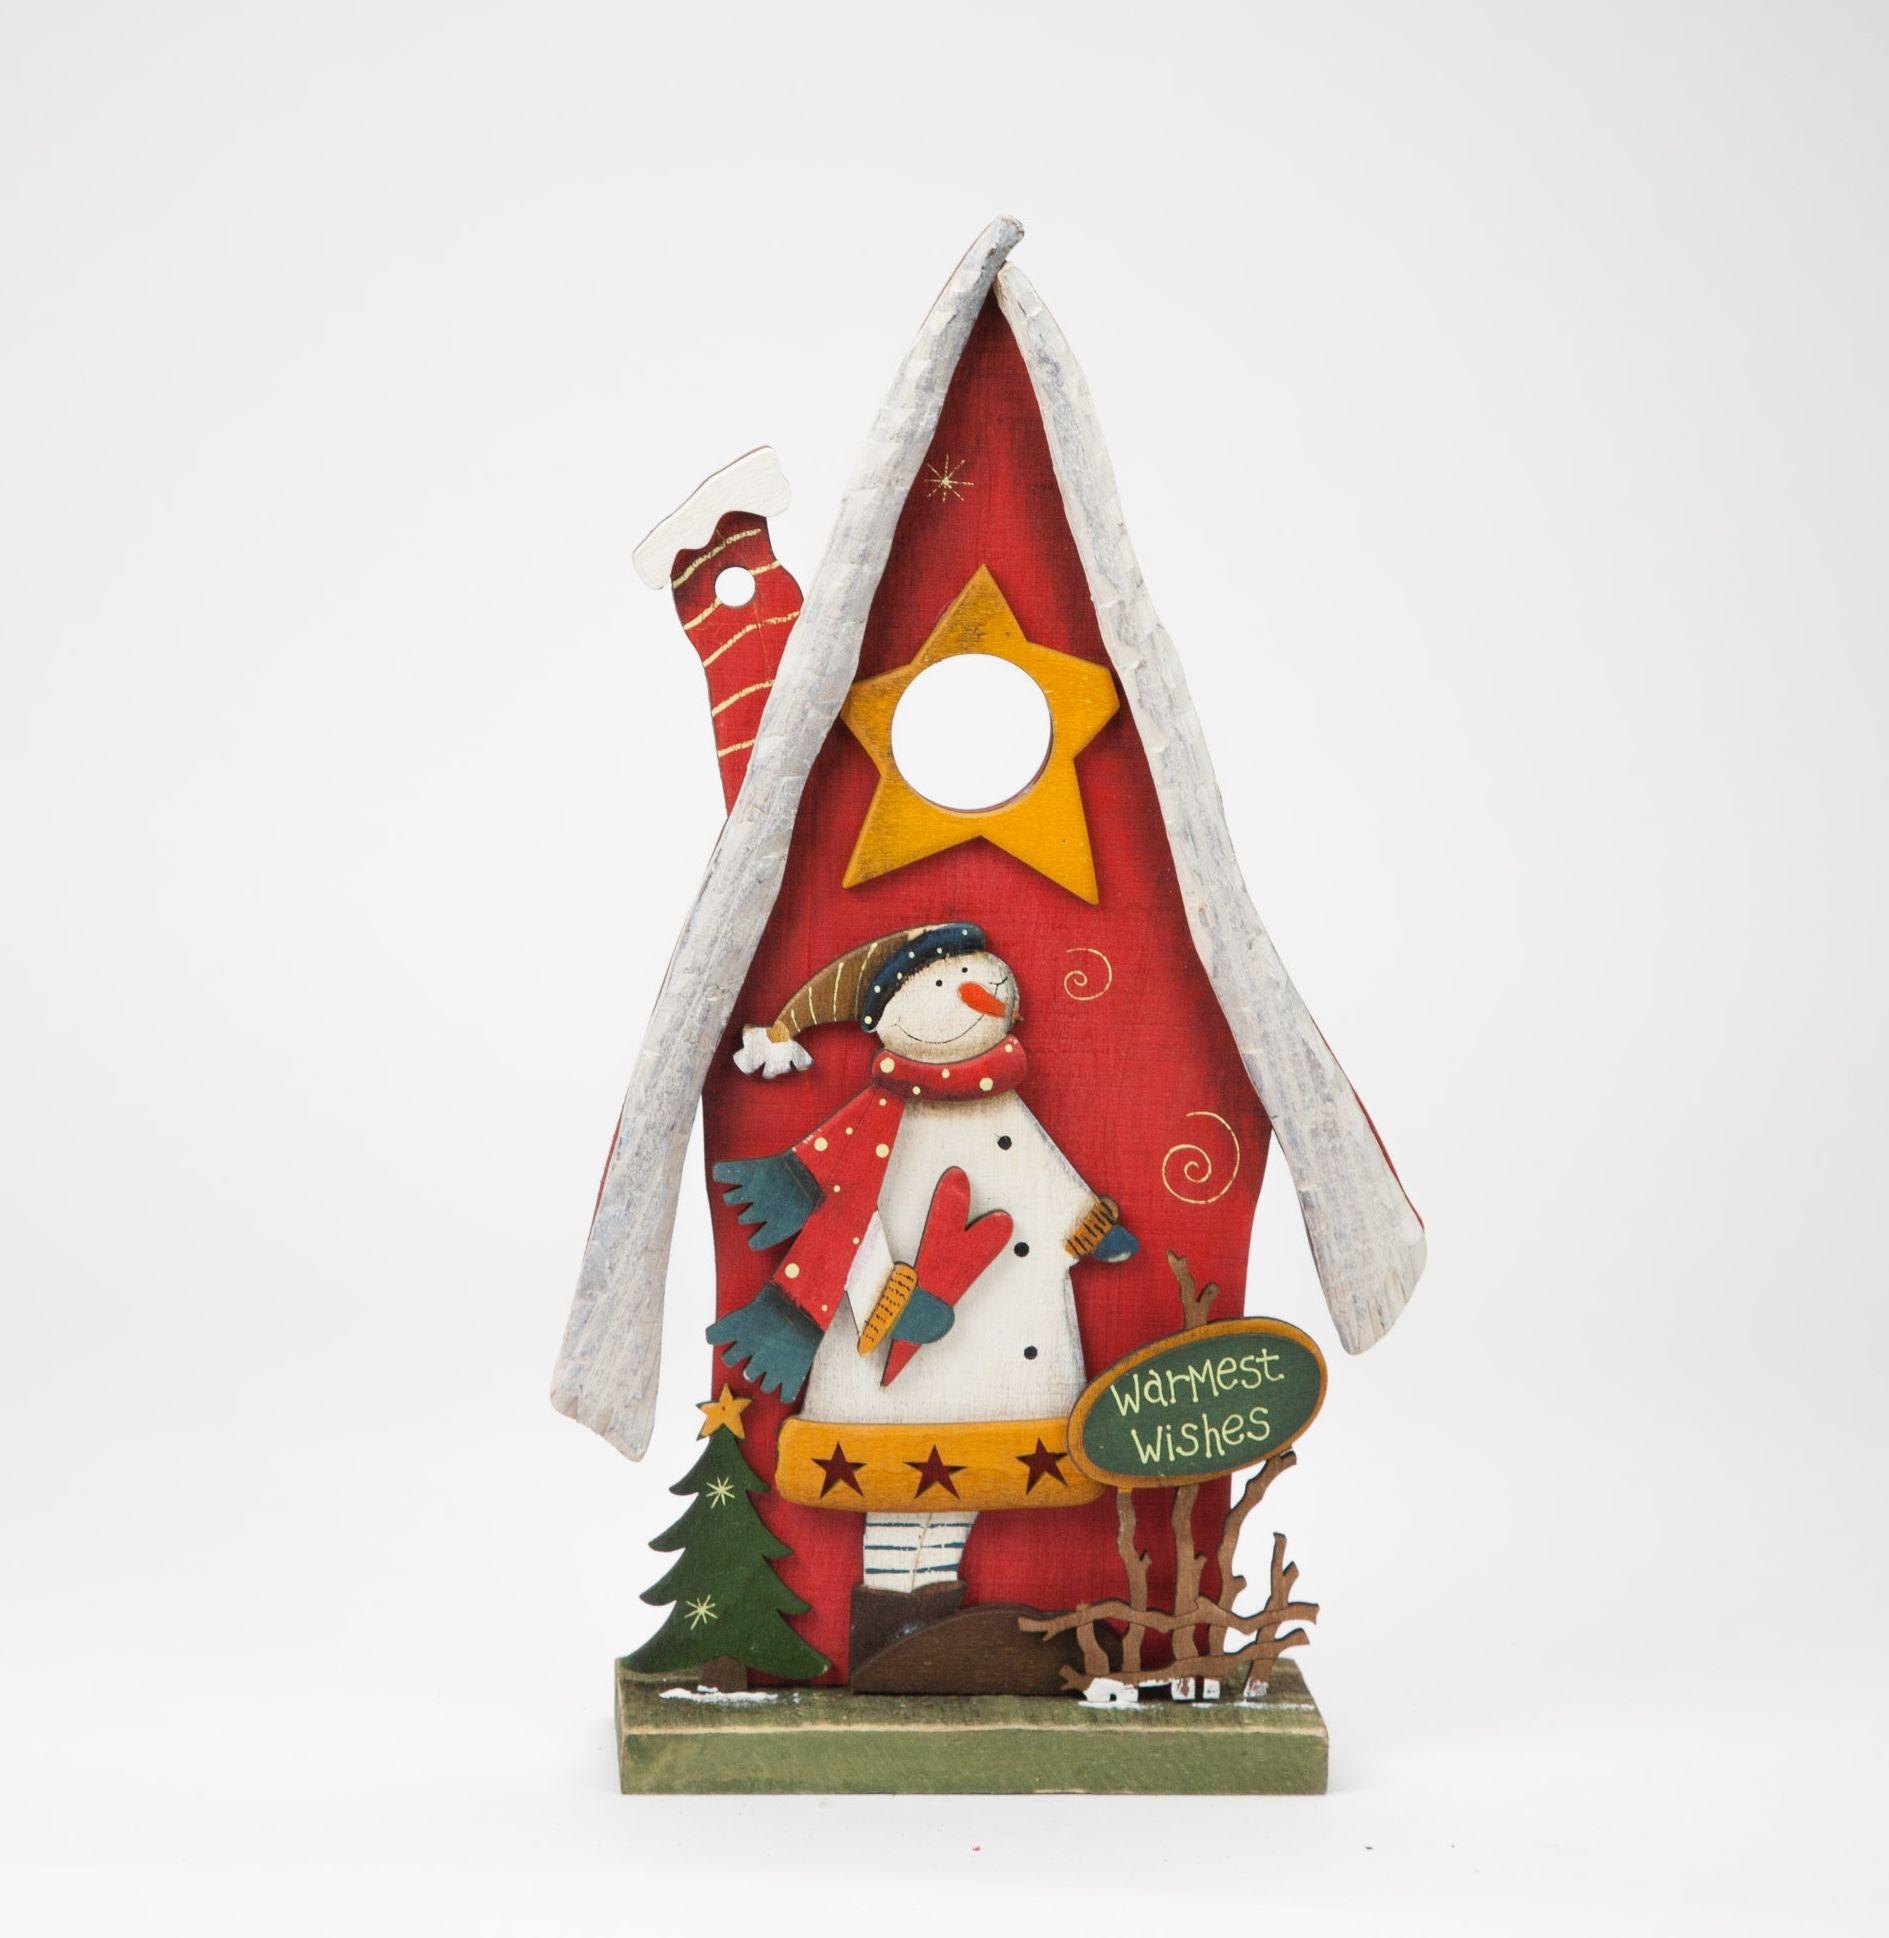 Casa Boneco de Neve 22 x 7 x 39 cm   A Loja do Gato Preto   #alojadogatopreto   #shoponline   referência 44265977